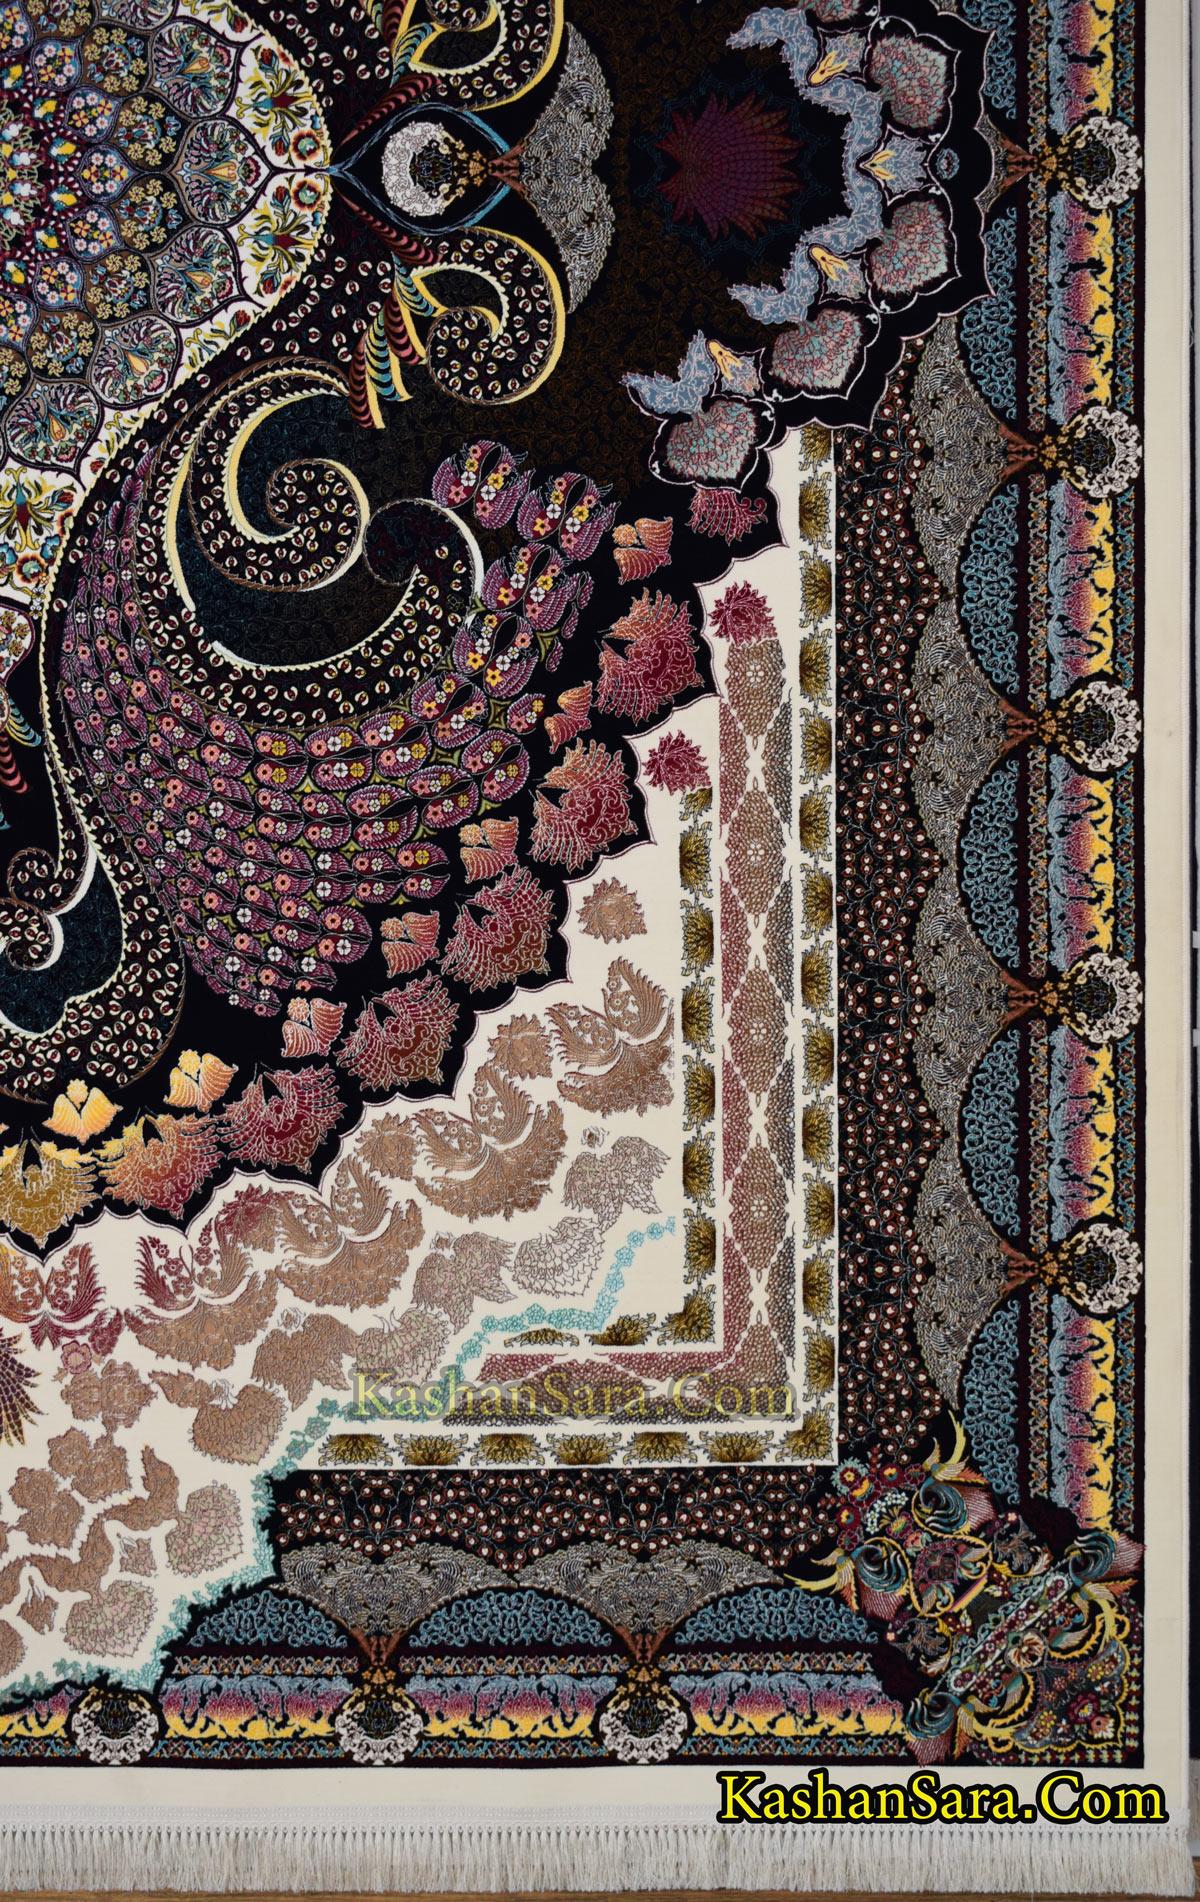 قیمت فرش ماشینی ۱۲۰۰ شانه طرح طاووس